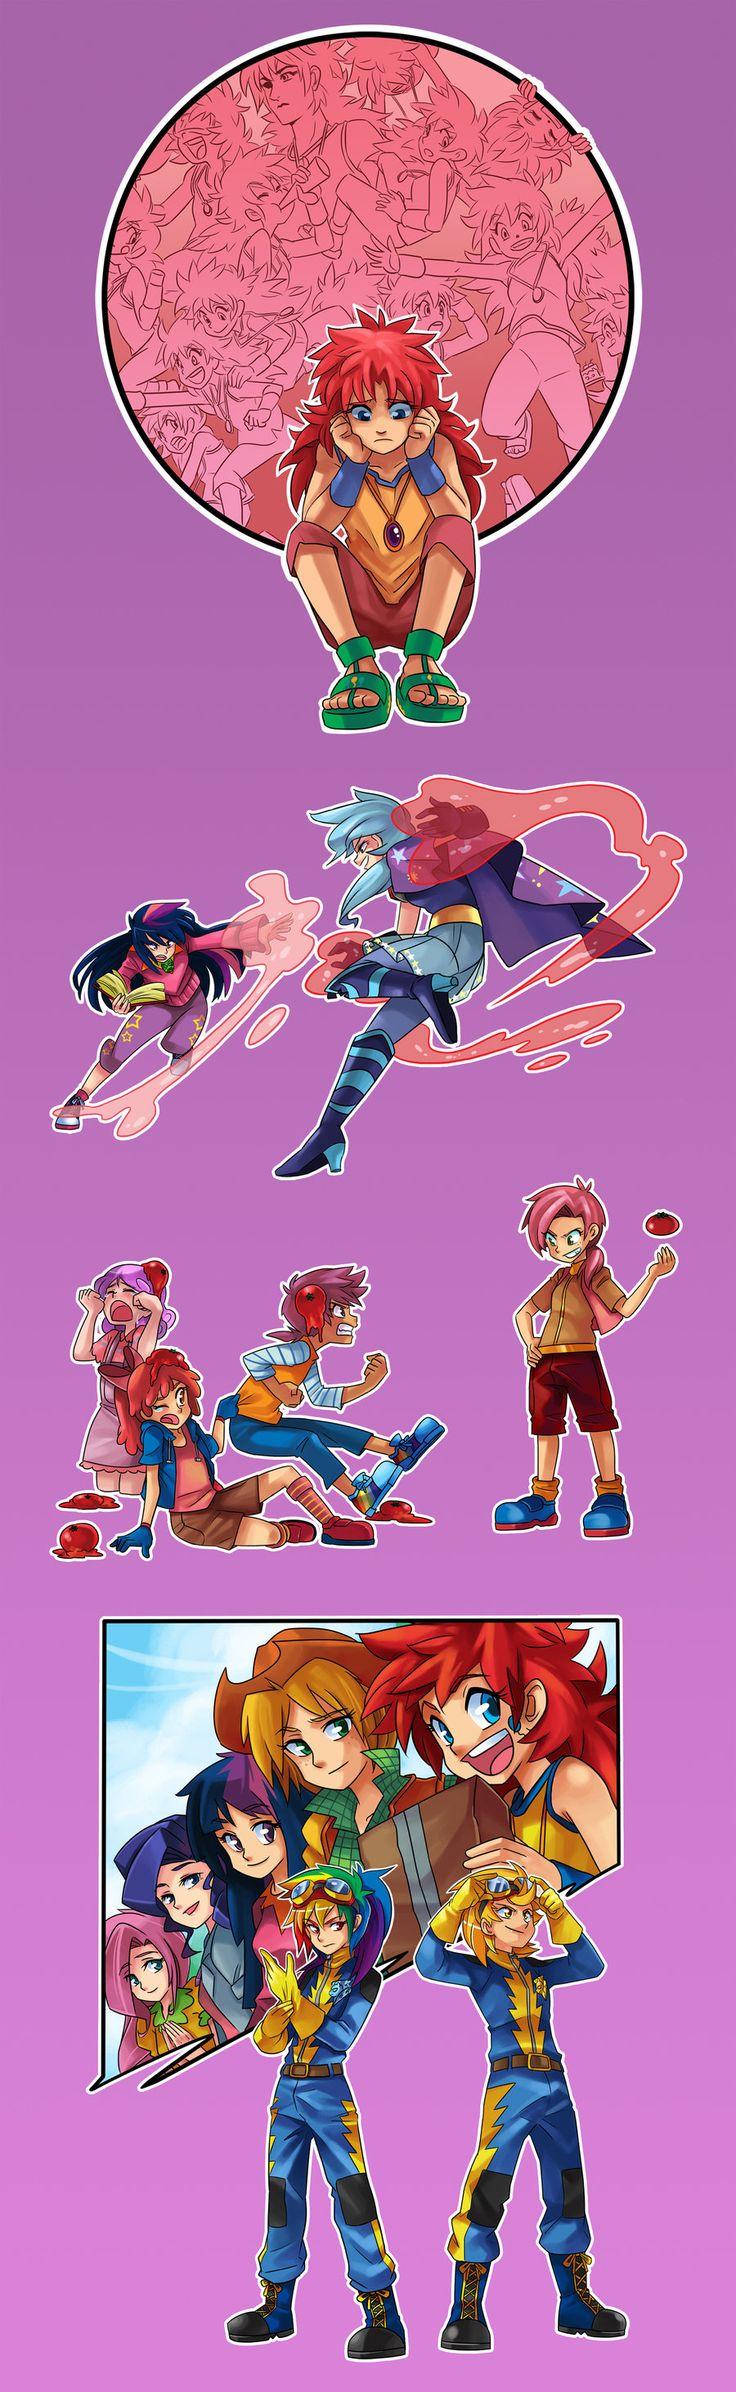 MLP- 3rd Season Episodic Illustrations by ~Sapphire1010 on deviantART